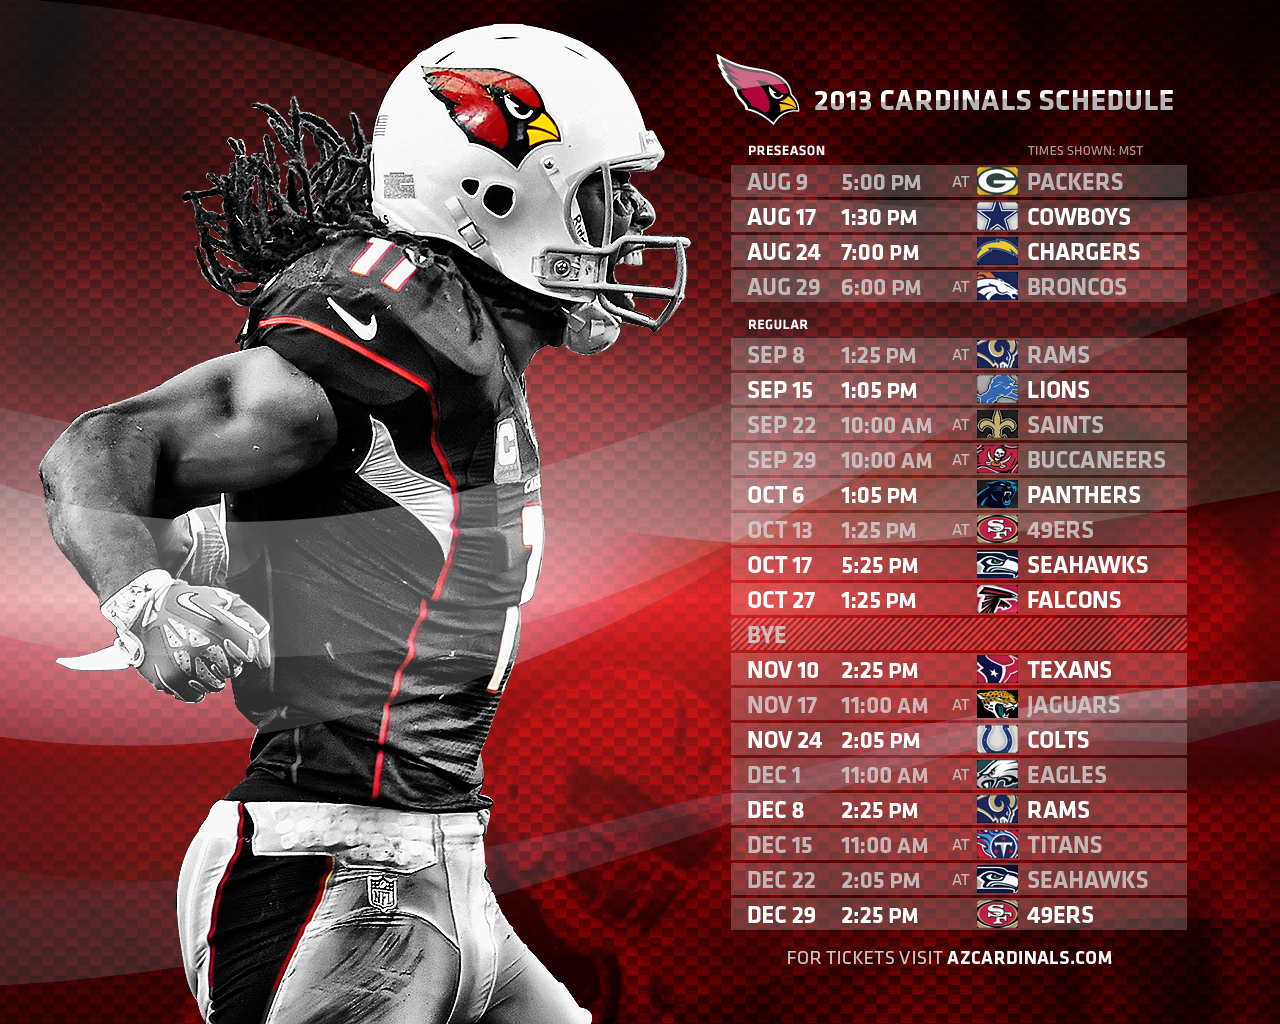 Arizona Cardinals Tickets 2015 Schedule Ticketcity 2016 Car Release 1280x1024